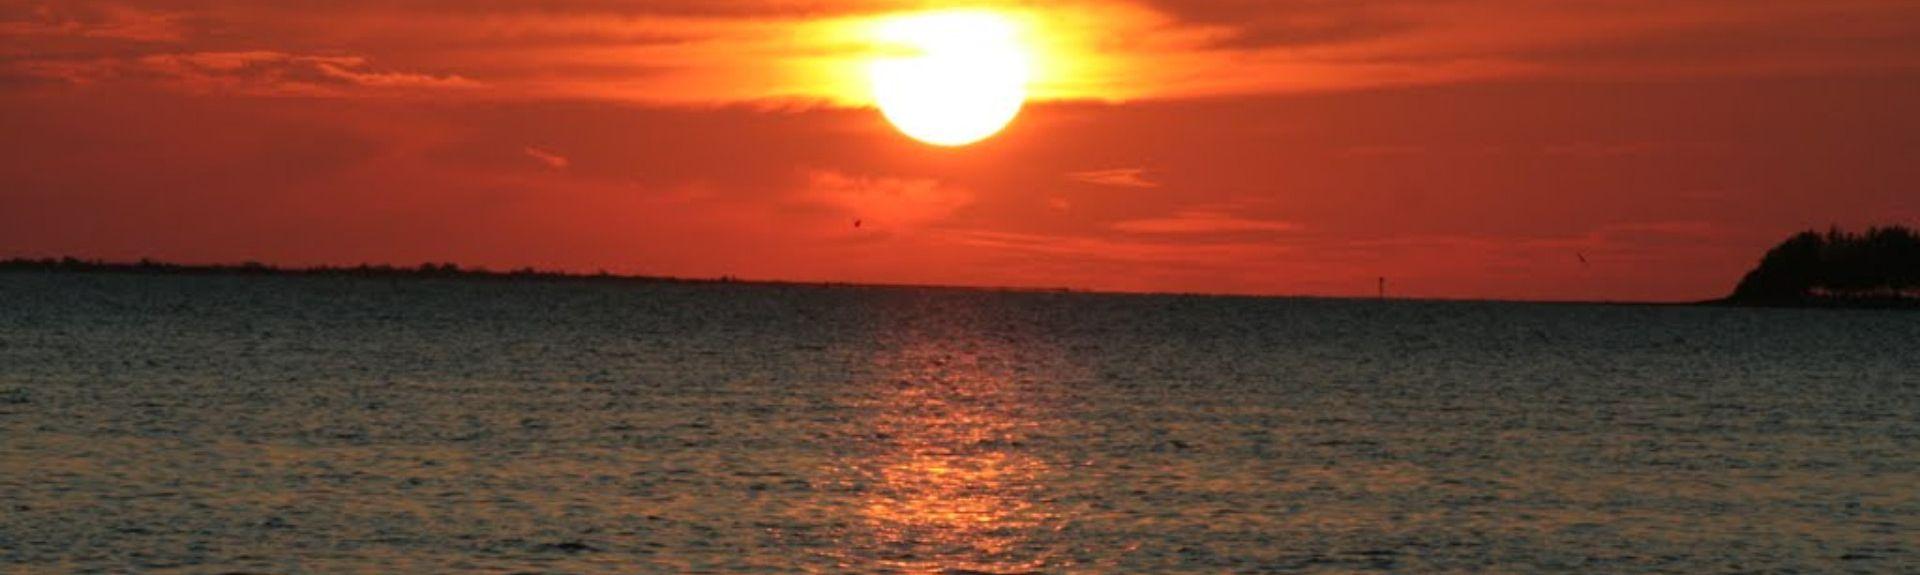 Trinity, Florida, United States of America